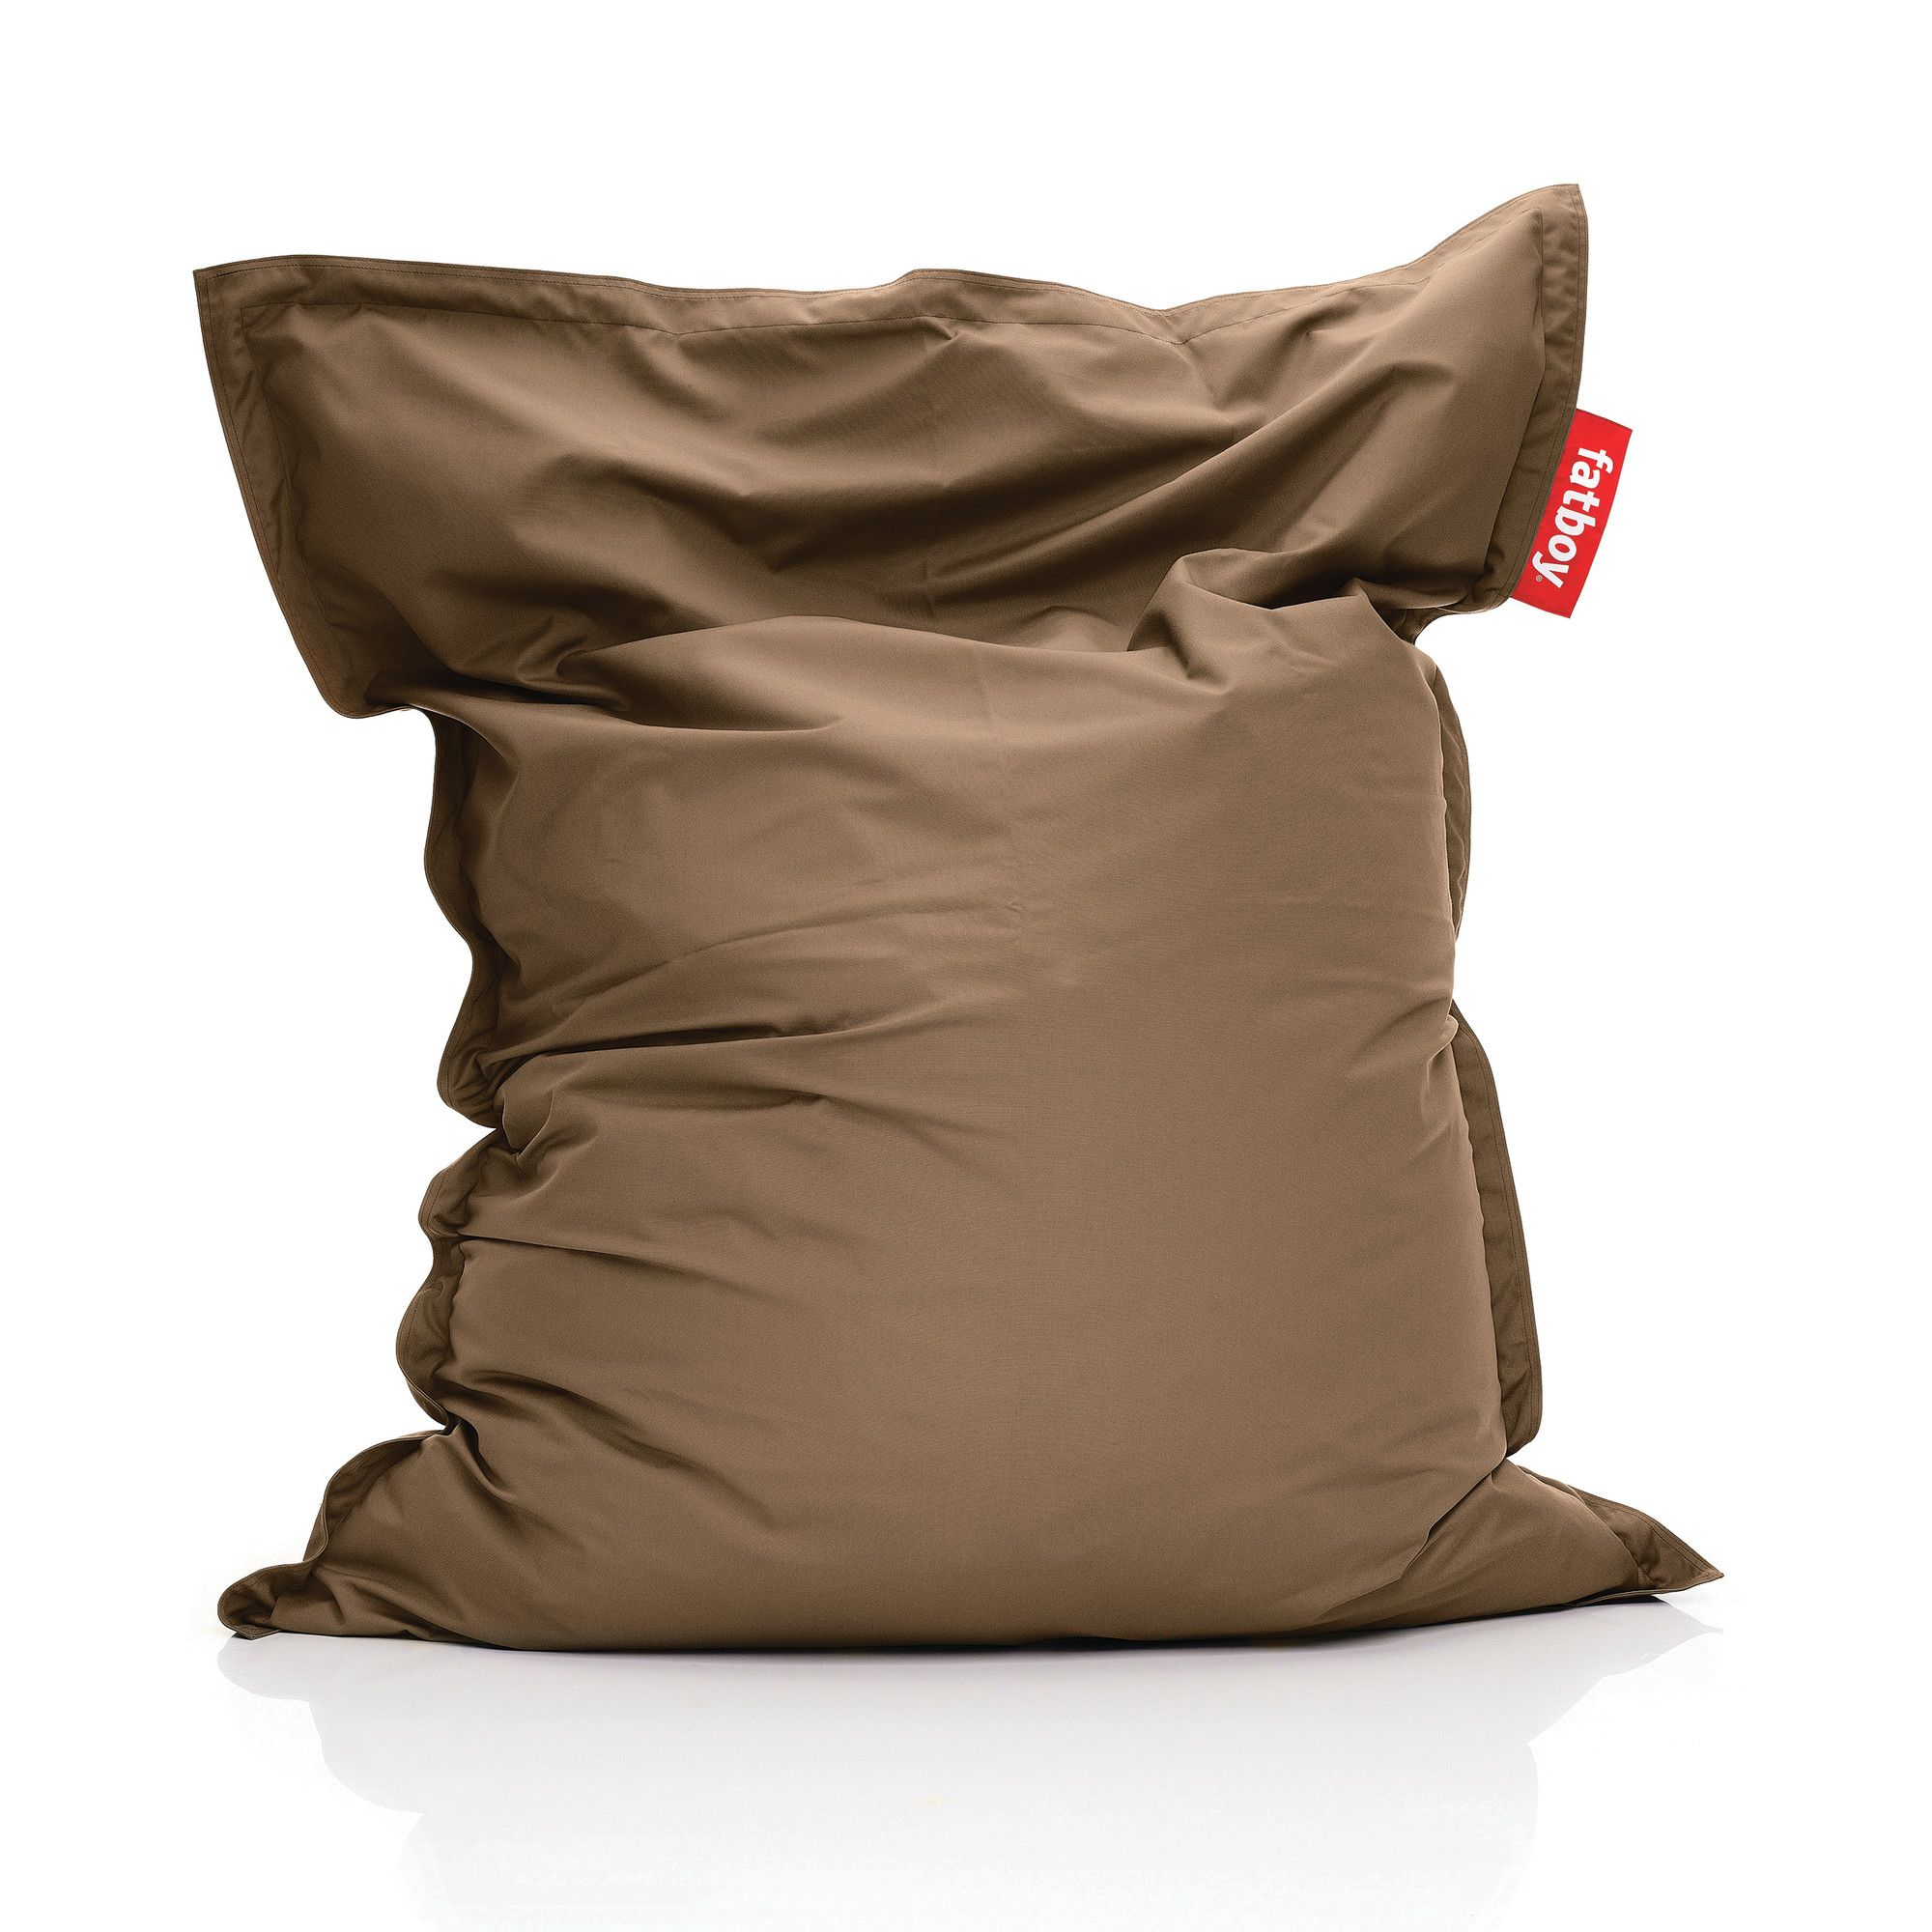 Fatboy Zitzak Camouflage.Large Sunbrella Outdoor Friendly Bean Bag Chair Outdoor Bean Bag